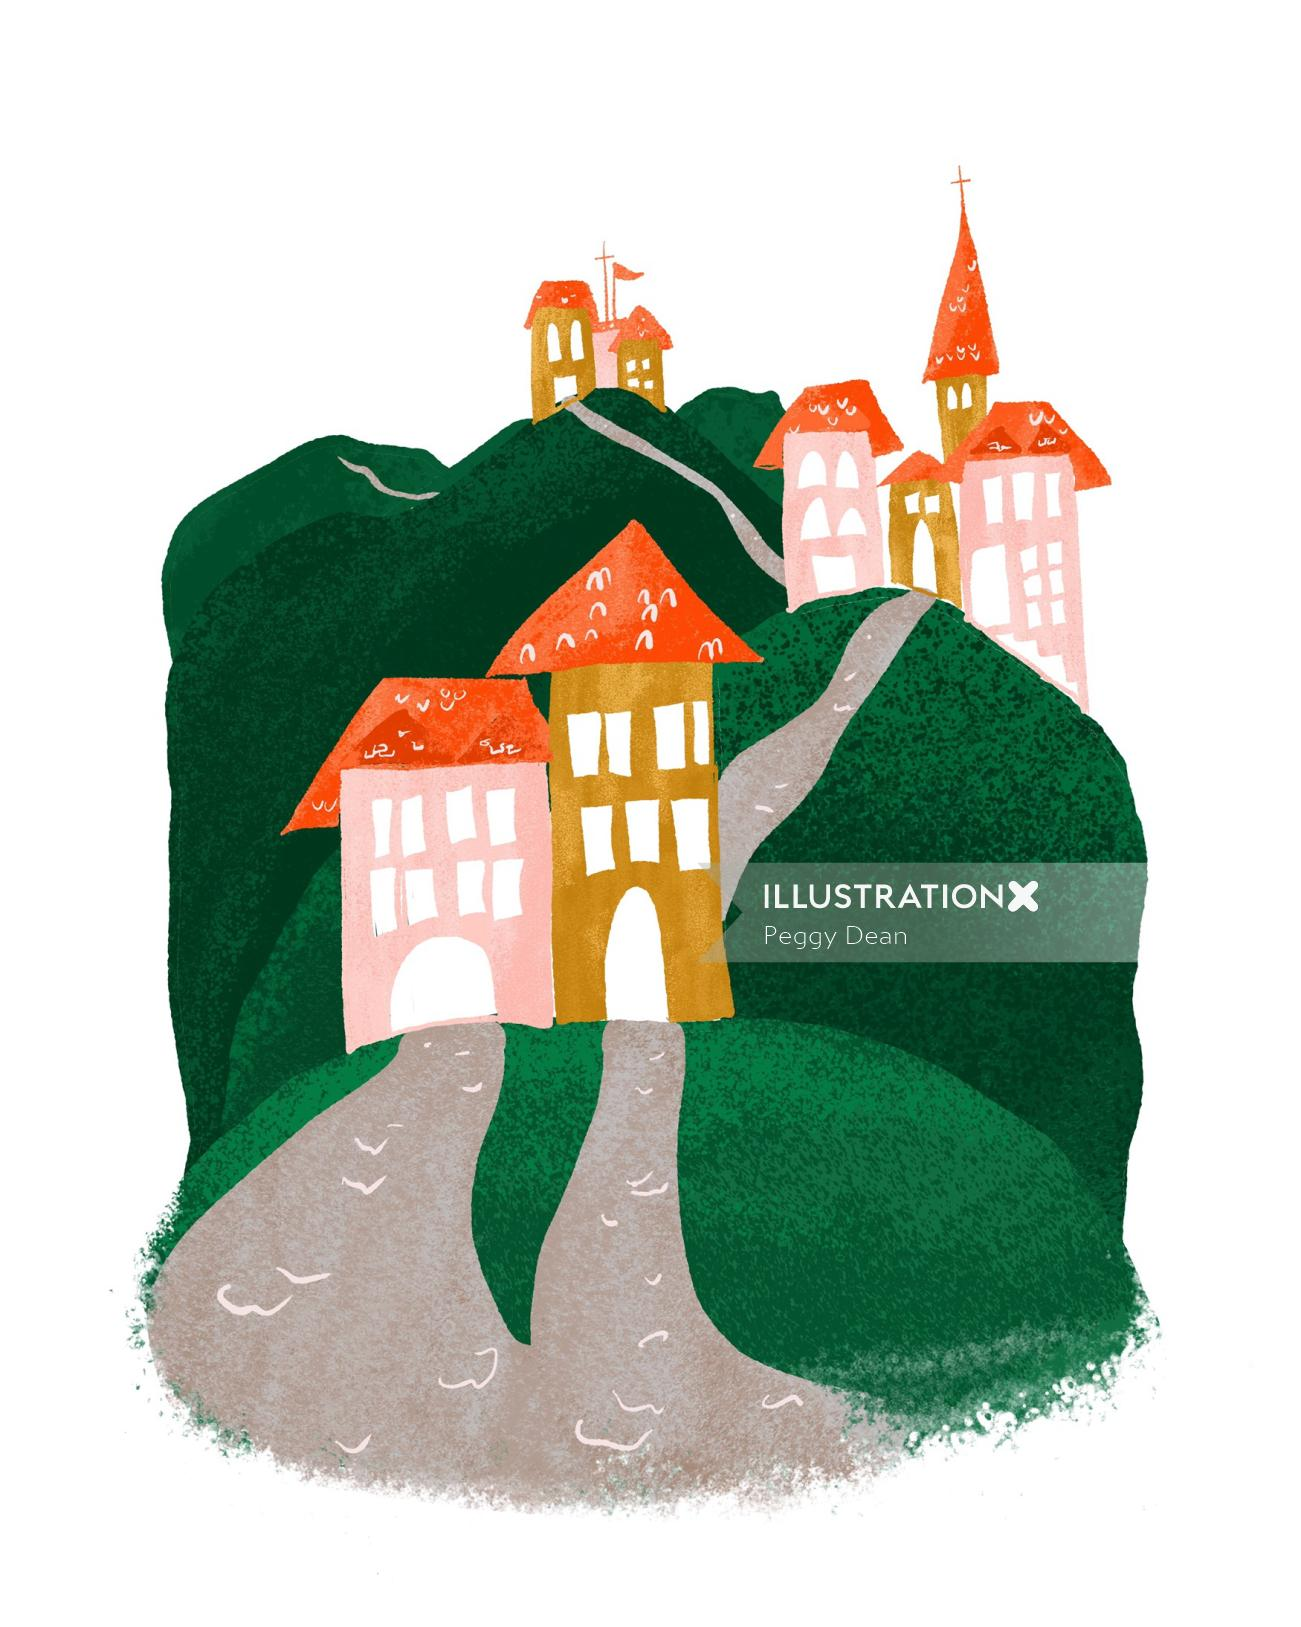 Storybook hillside village